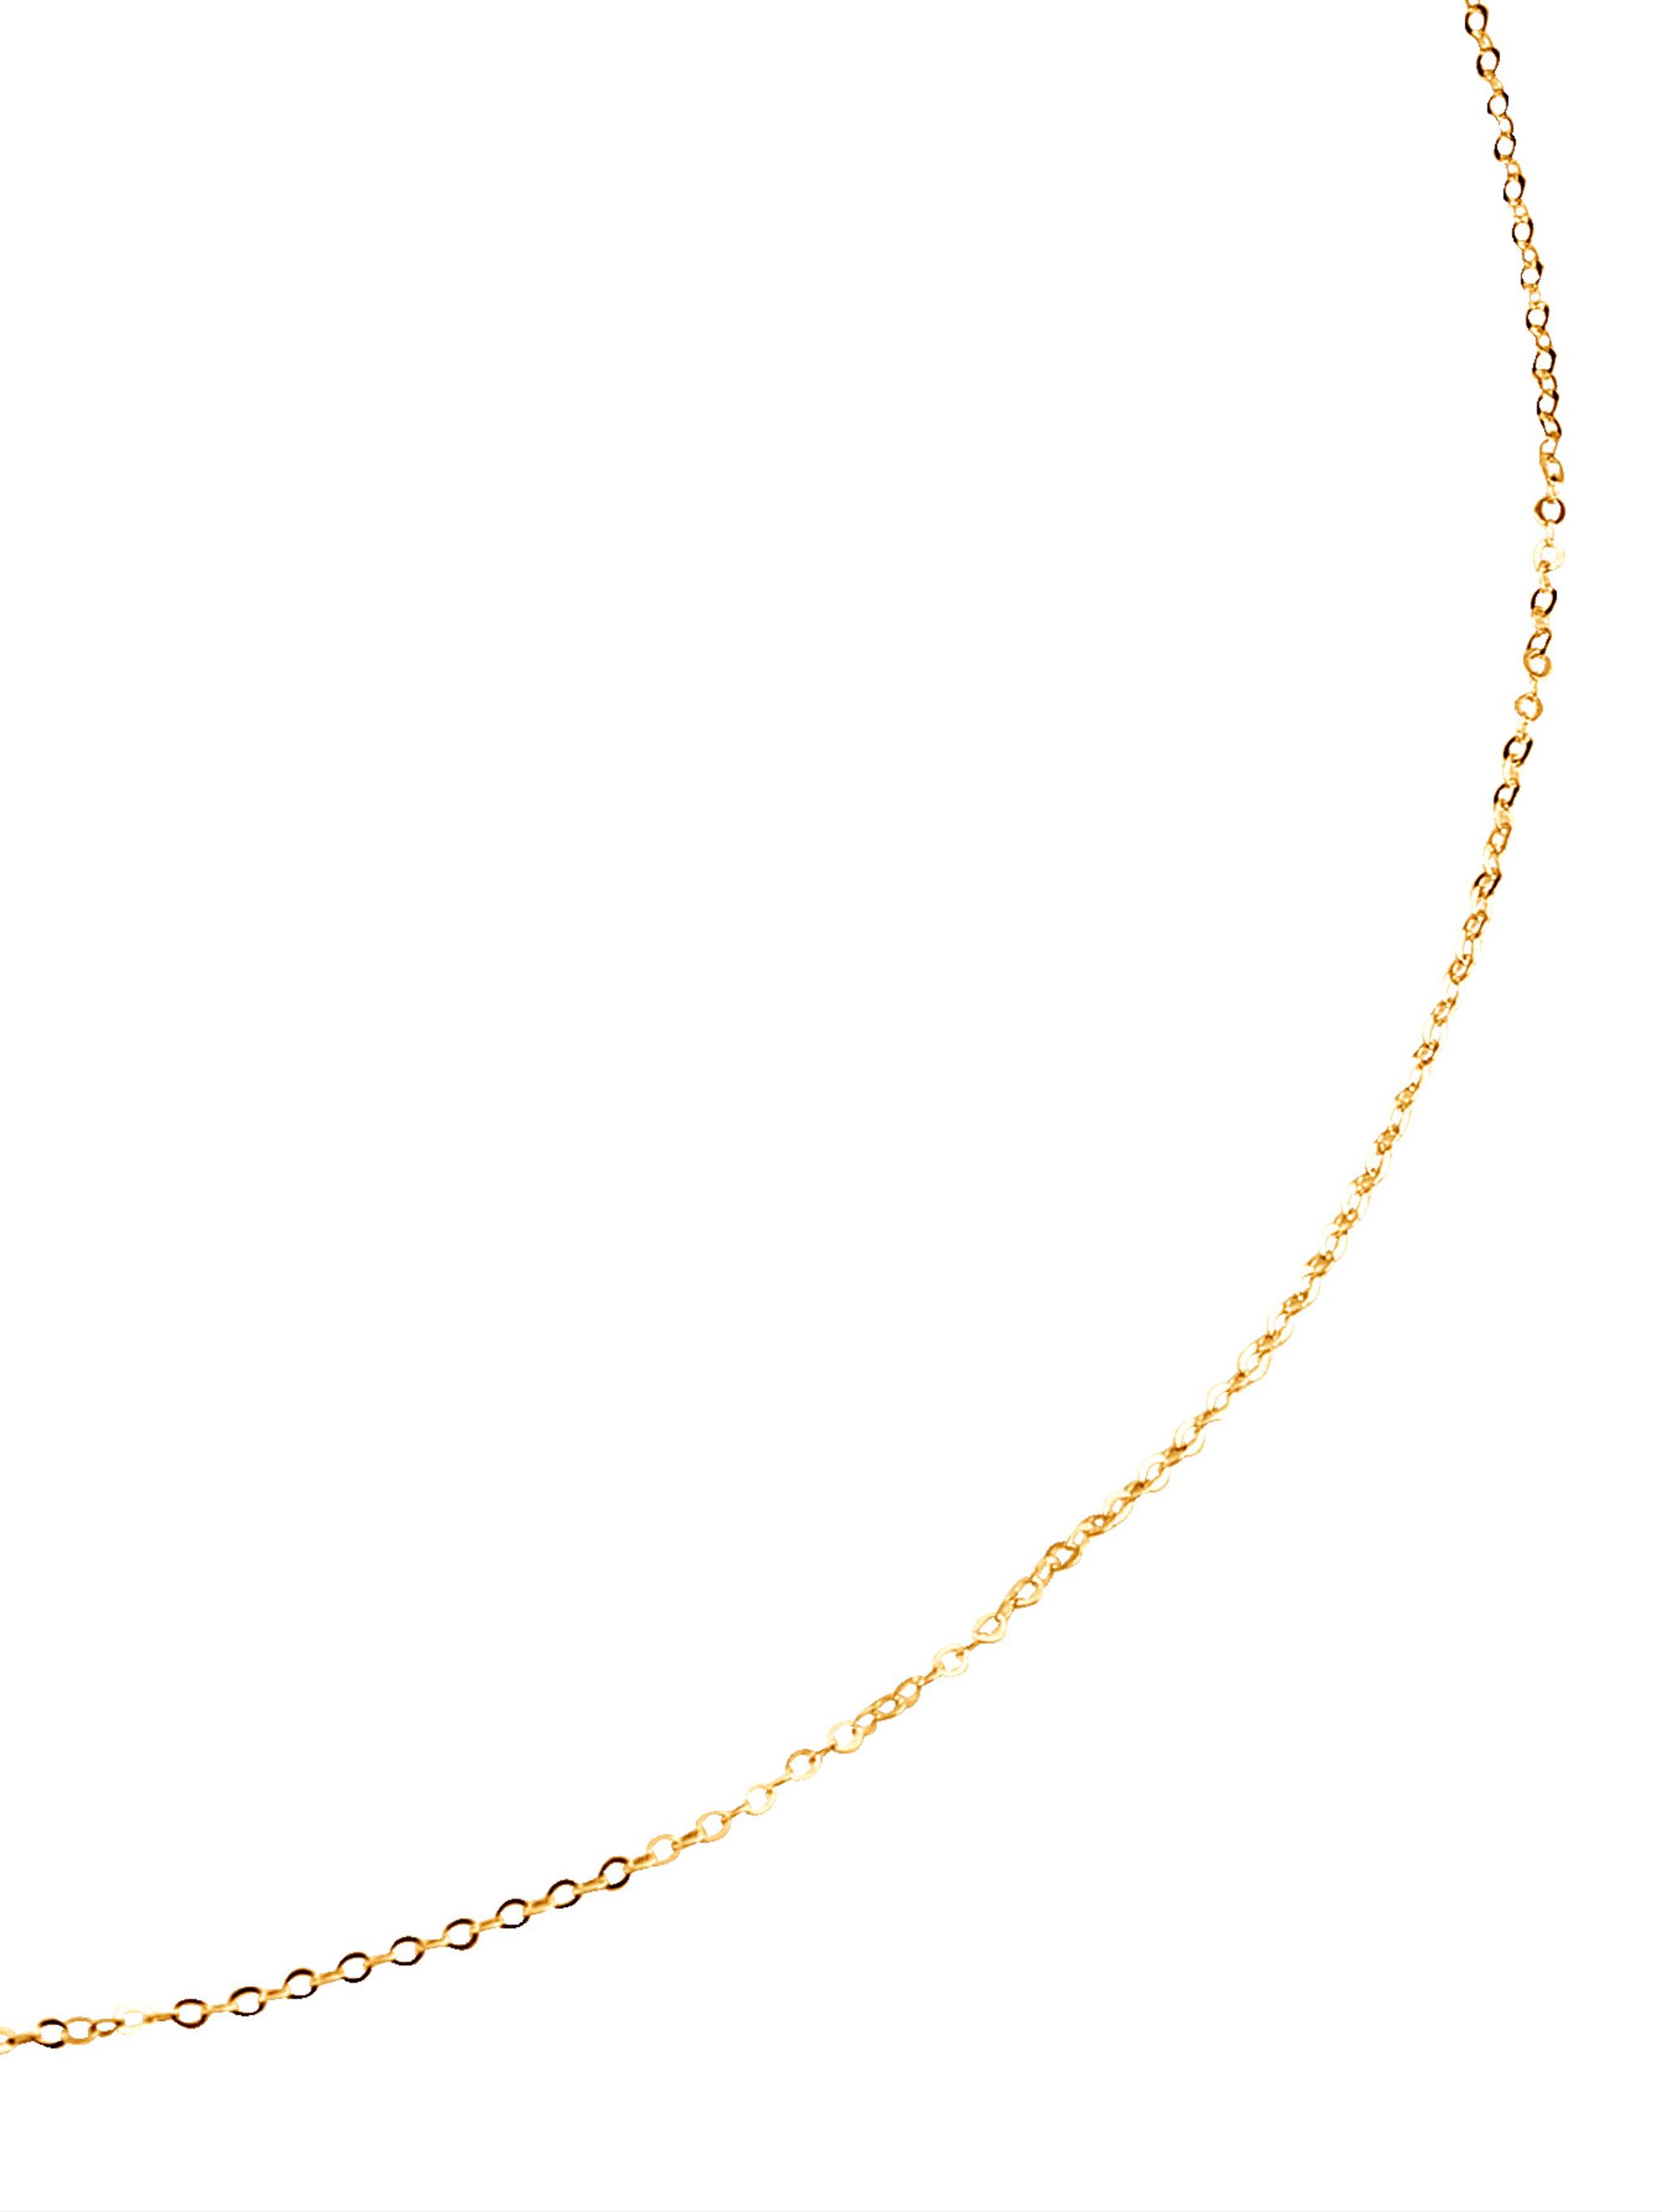 Ankerkette in Gelbgold WEfgE